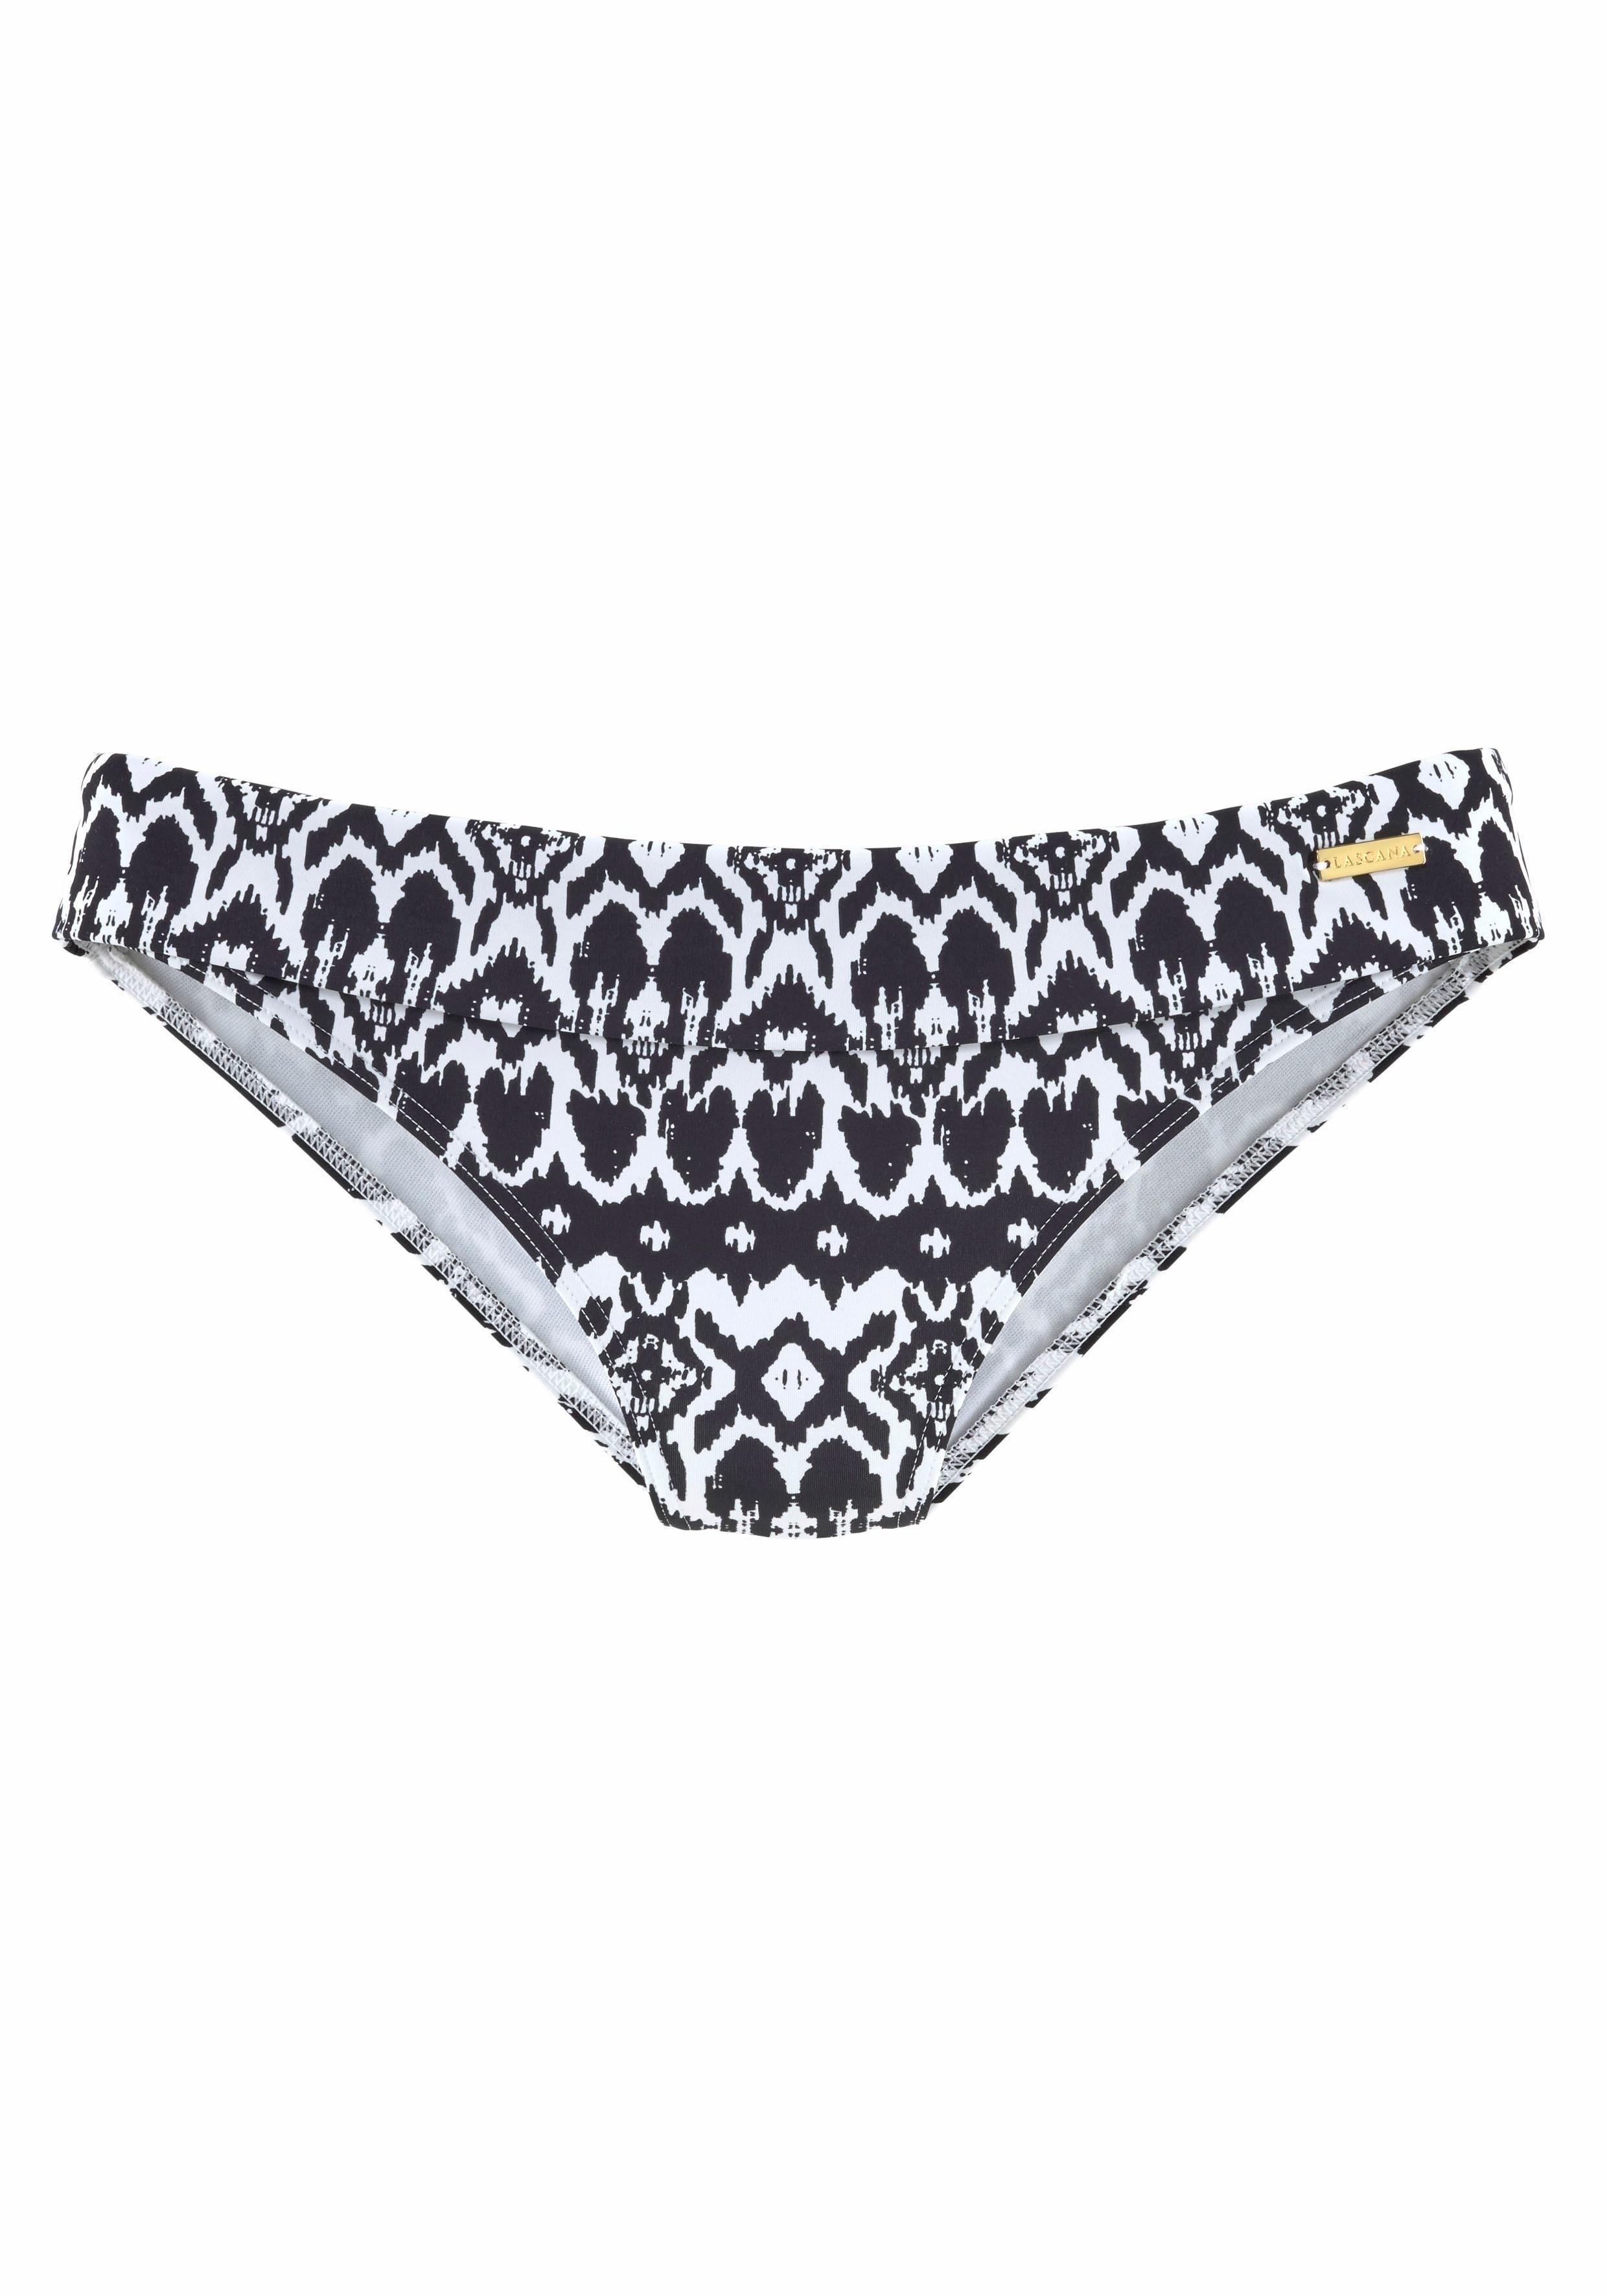 Lascana Bikinibroekje Grace met omslagband - verschillende betaalmethodes